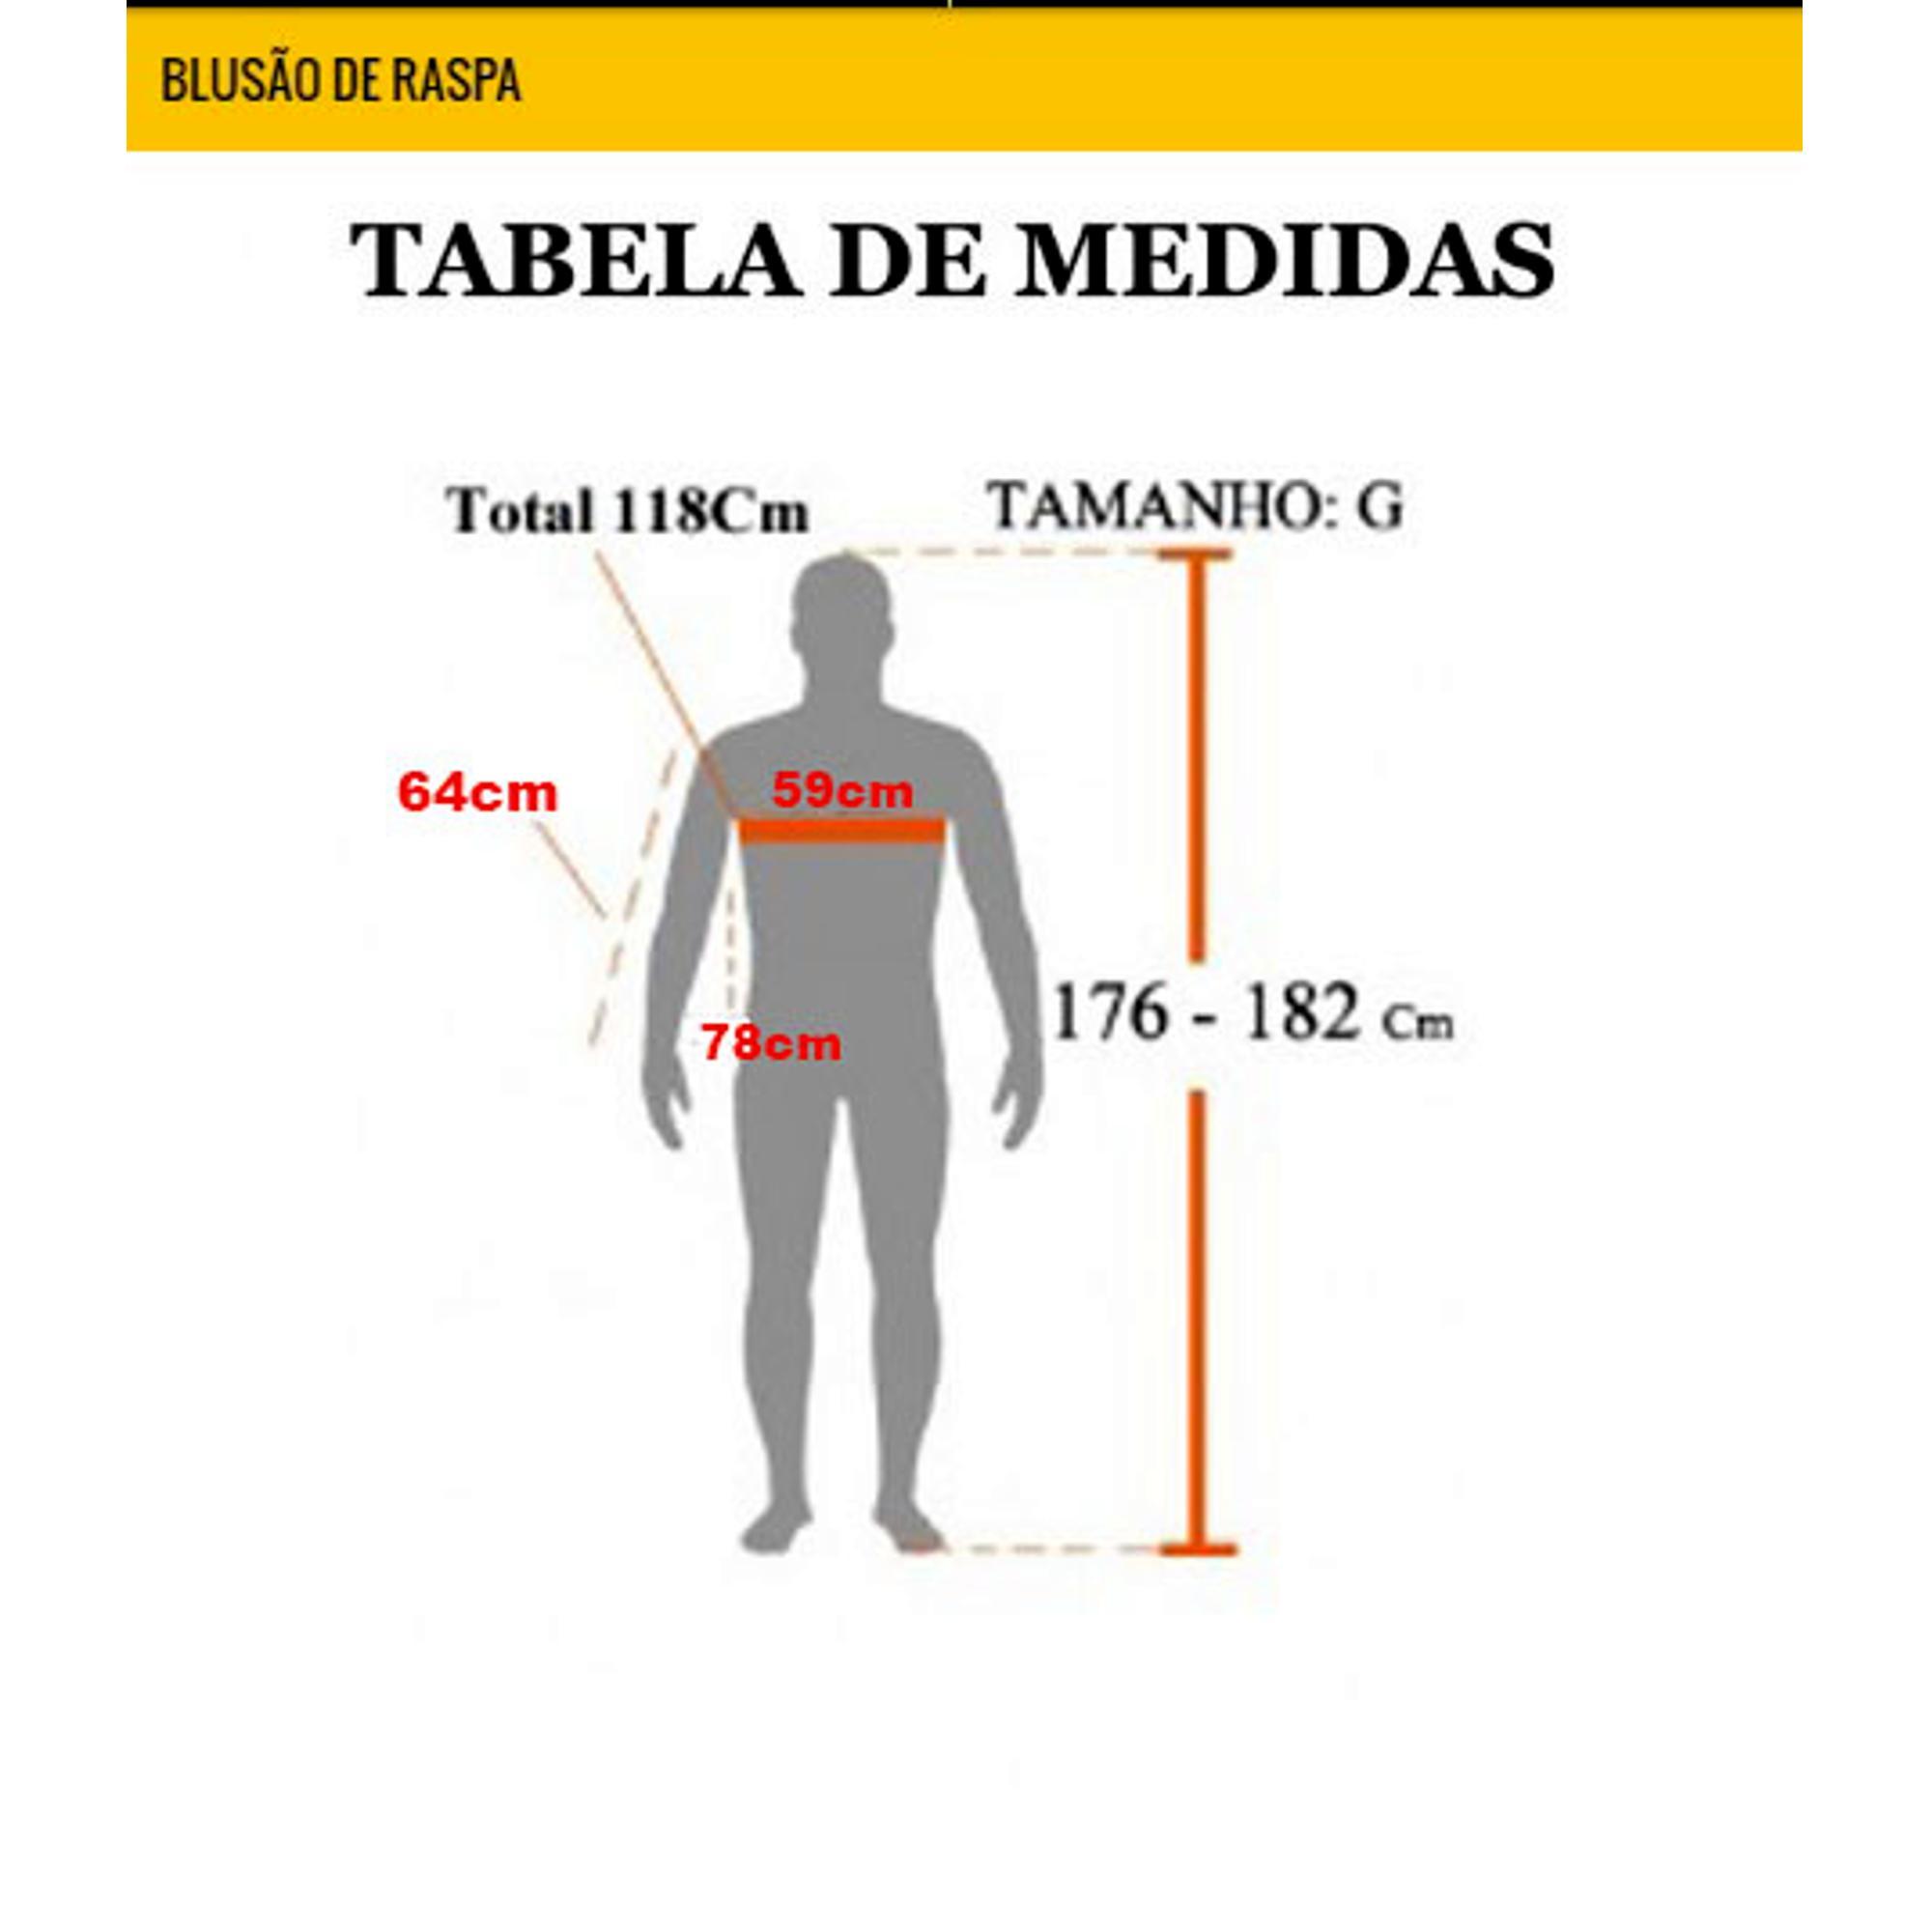 BLUSAO DE RASPA COM VELCRO TEKNOLUVAS CA17644